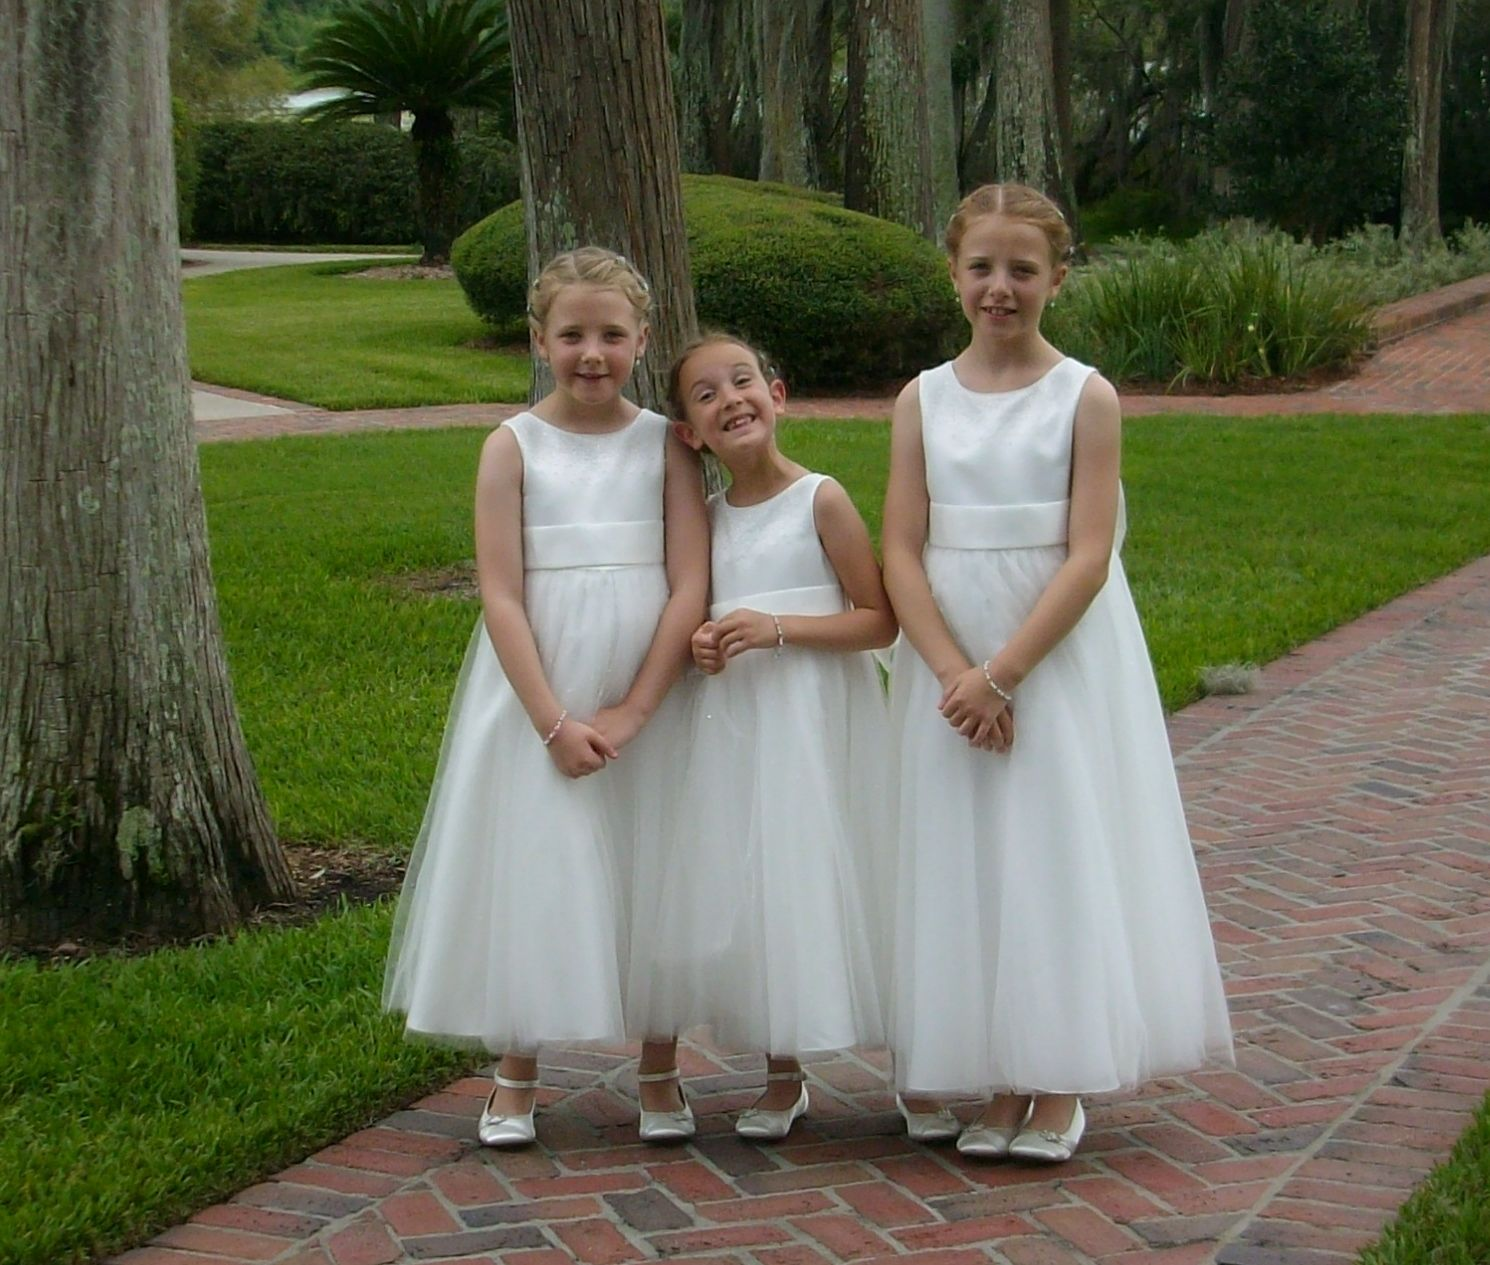 Cypress Grove Estate House Destination Wedding In Orlando Florida Cute Flower Girls At A Virgin Holidays Ceremony